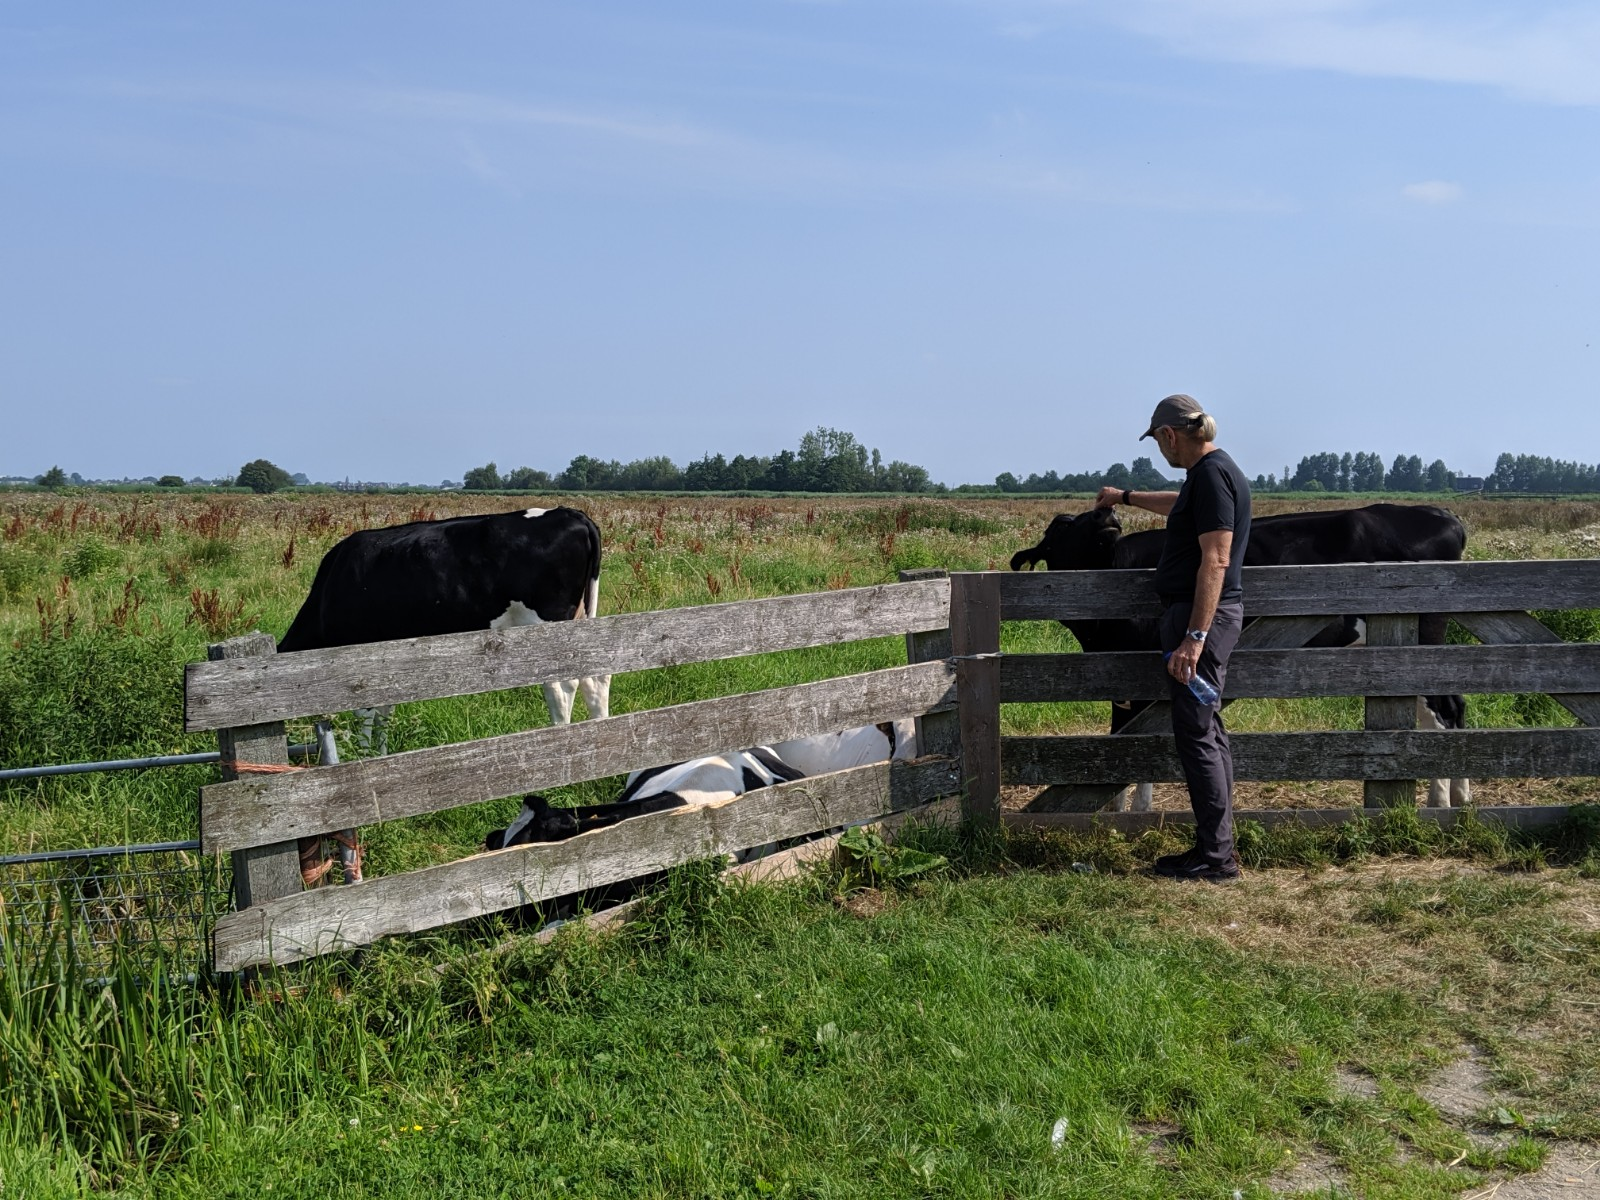 The quintessential dutch cow.